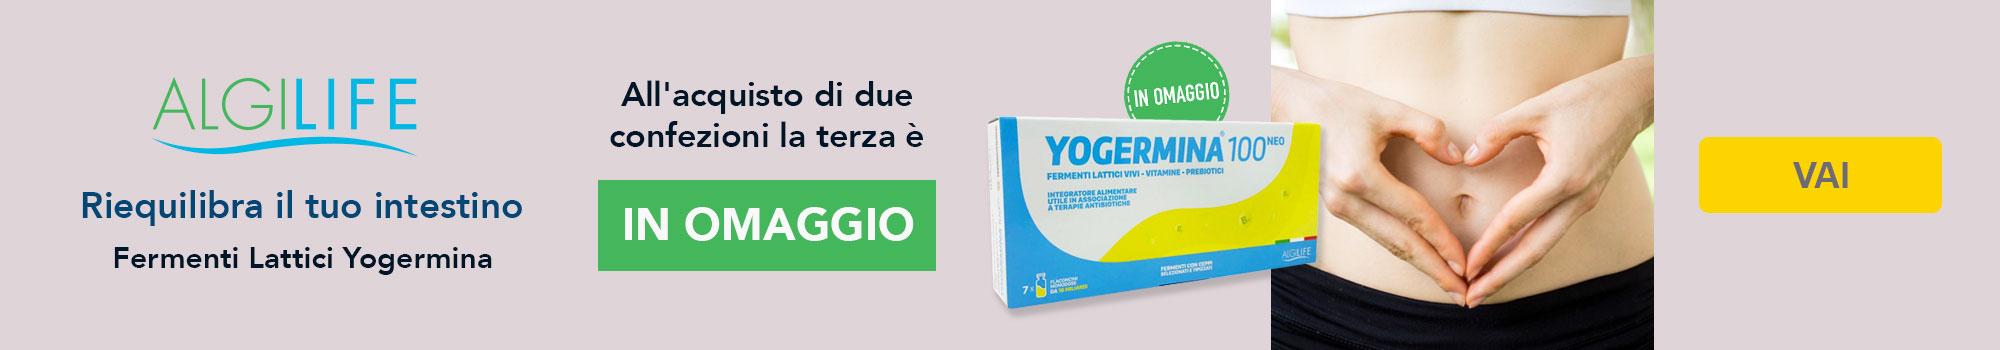 yogermina algilife